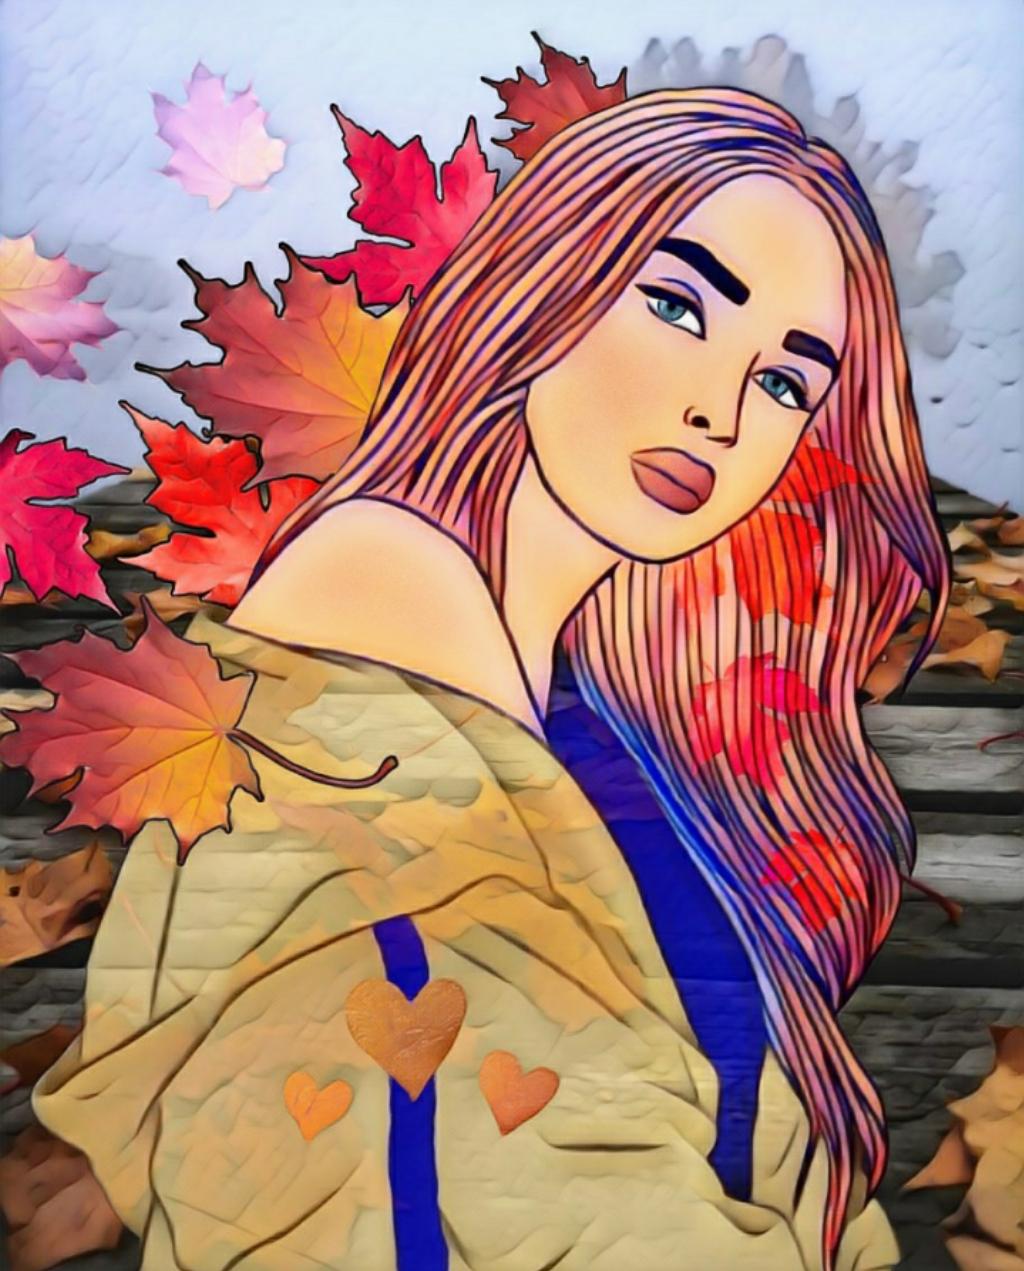 Autumn L❤VE #freetoedit #pose #prettygirl #outdoors #leaves #autumn #fall #seasons #colourful